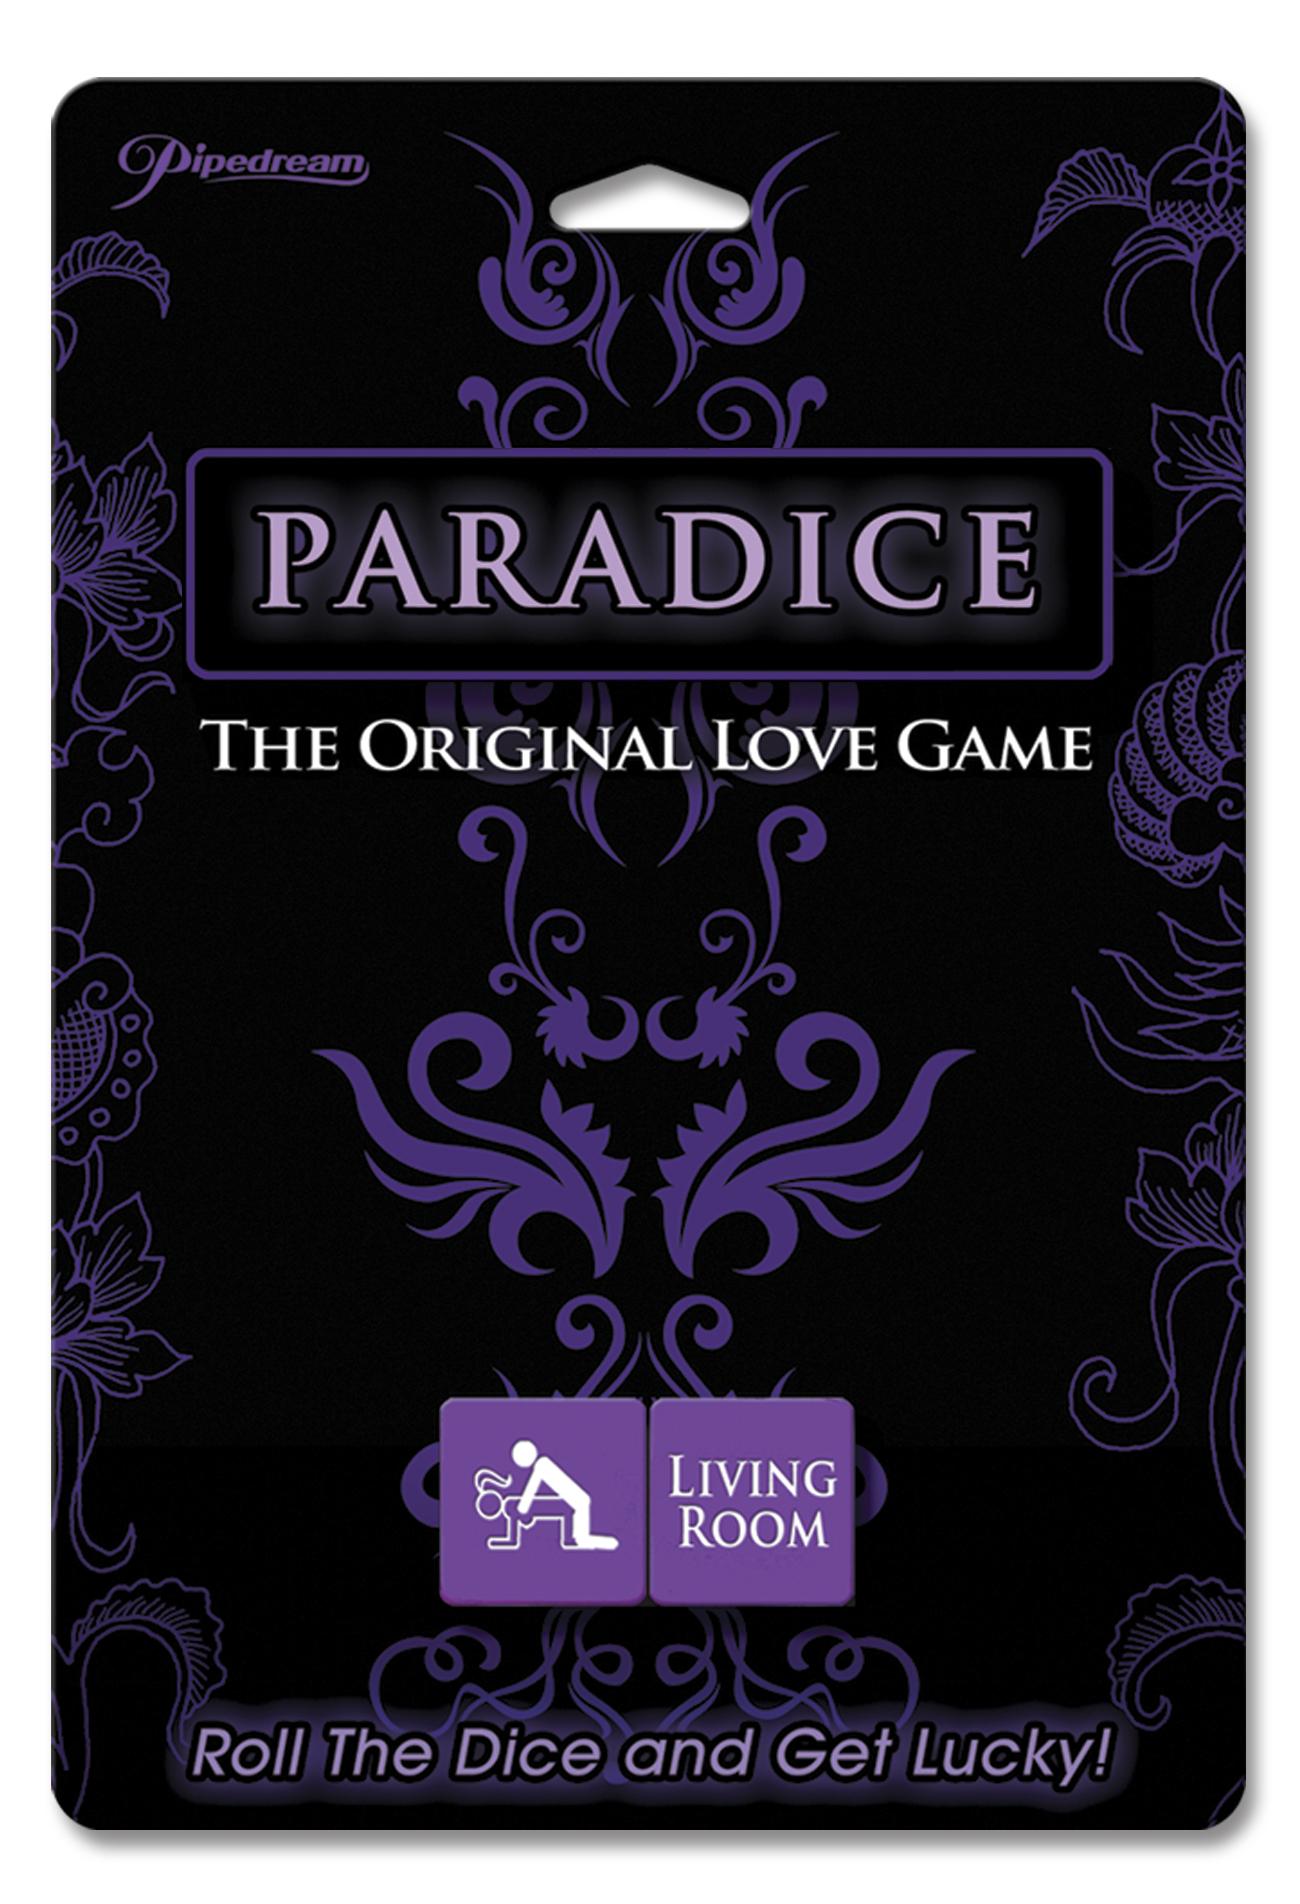 PARADICE - THE ORIGINAL LOVE GAME